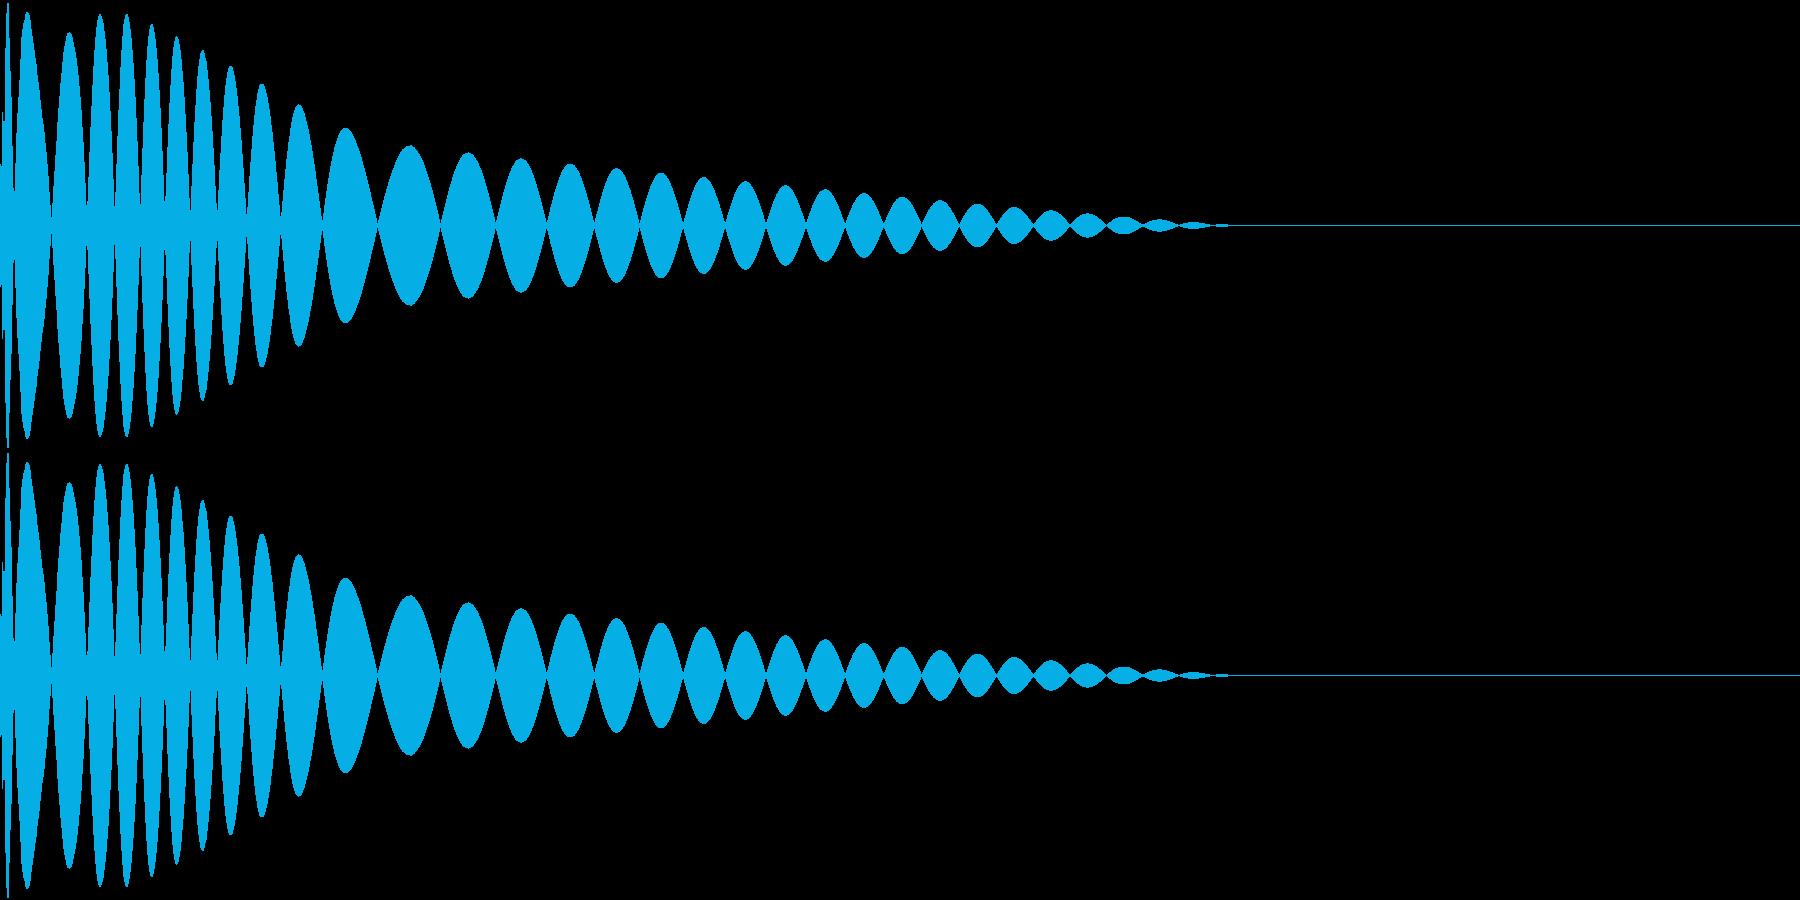 DTM Kick 18 オリジナル音源の再生済みの波形